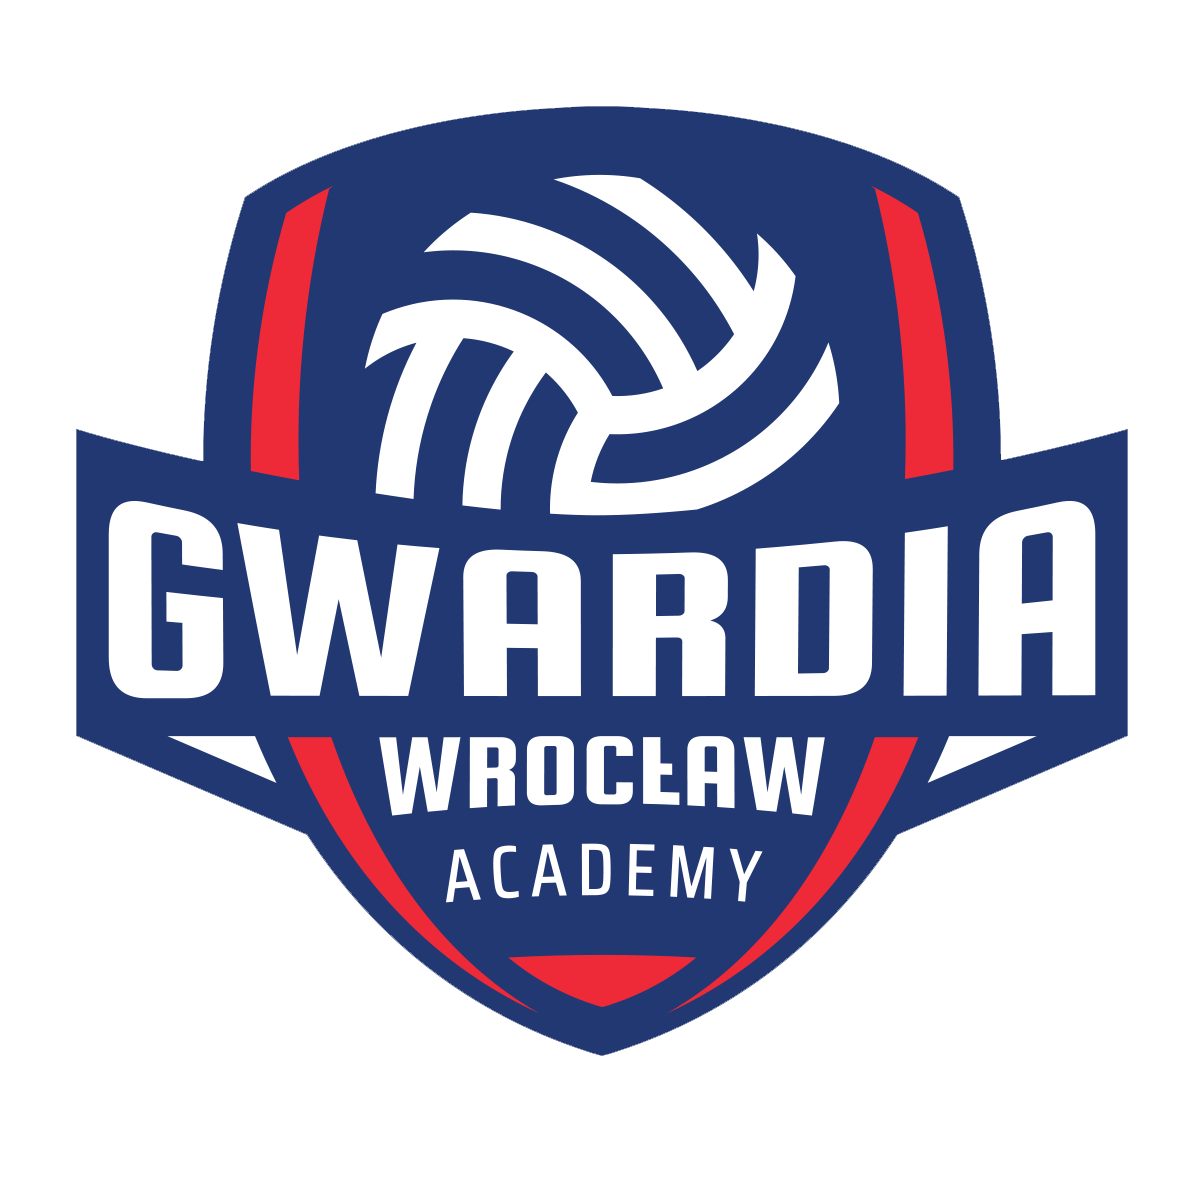 Gwardia Wrocław Academy Logo